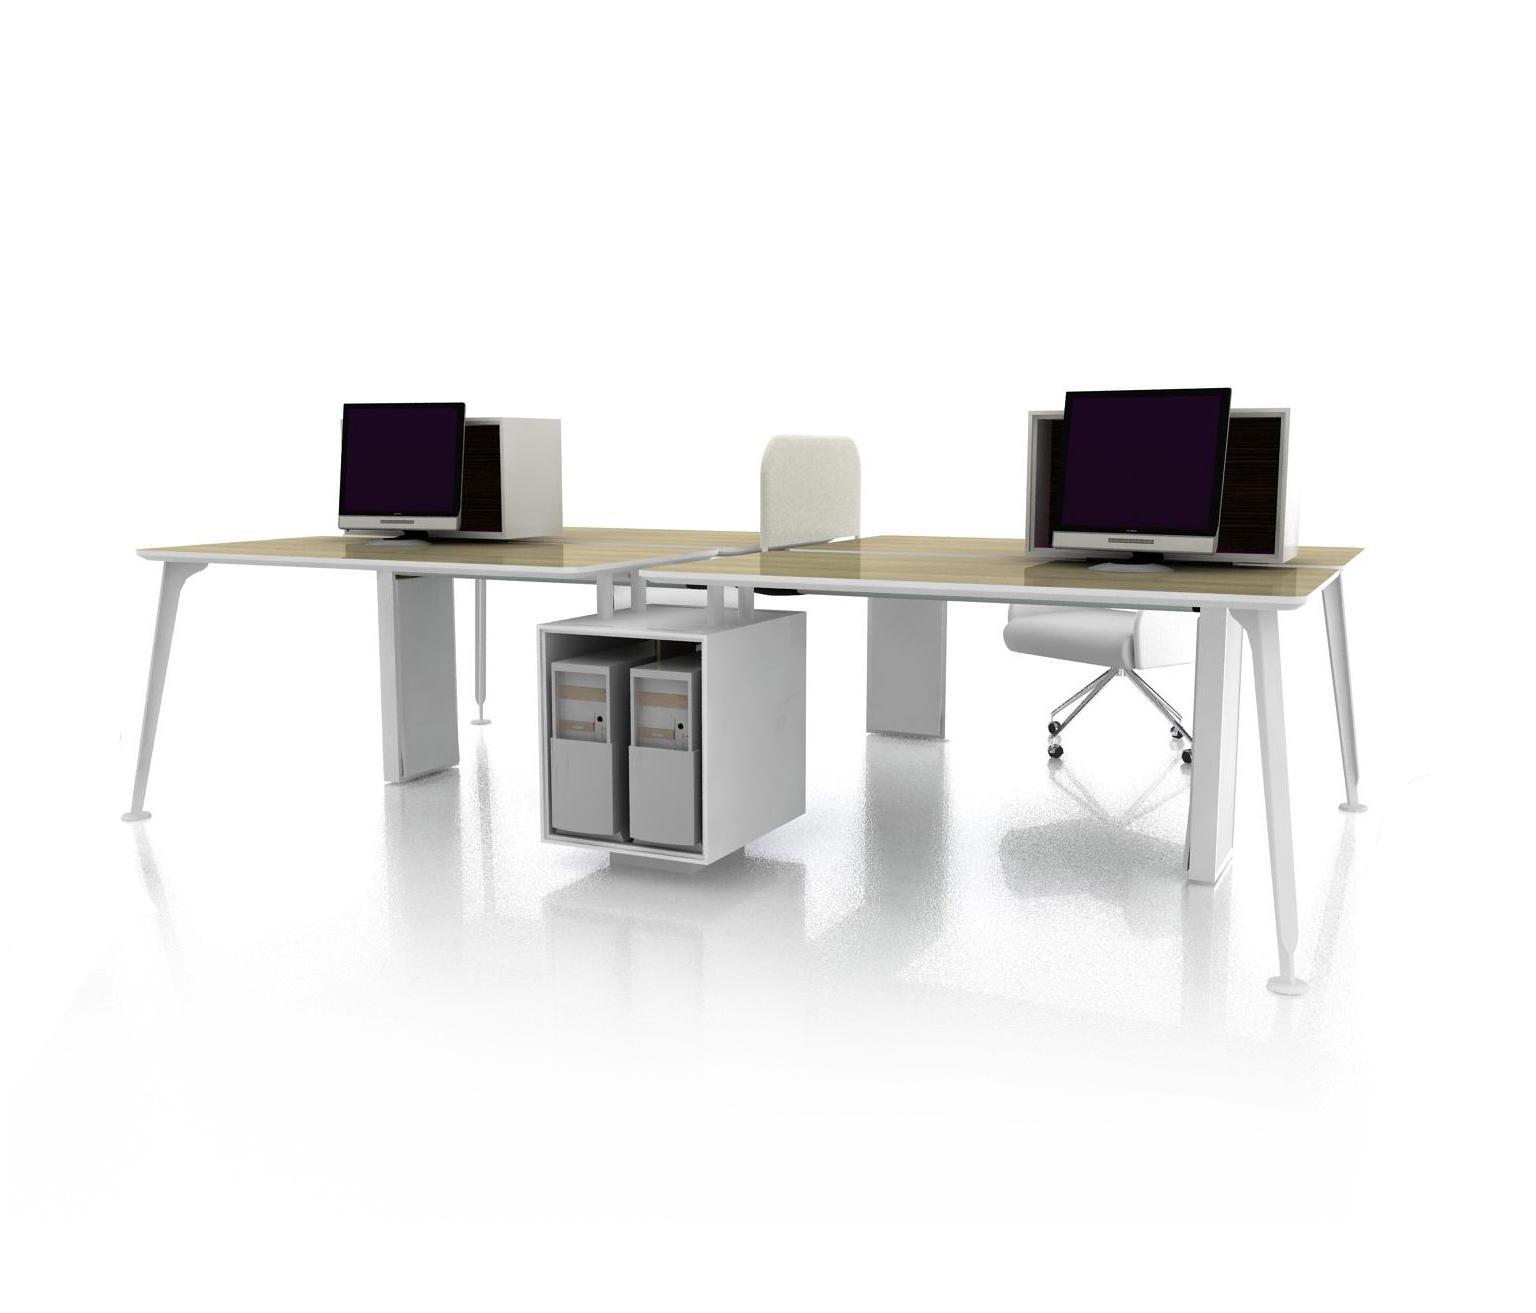 Company multioperative sistemi tavolo jos mart nez for Arredo urbano in inglese